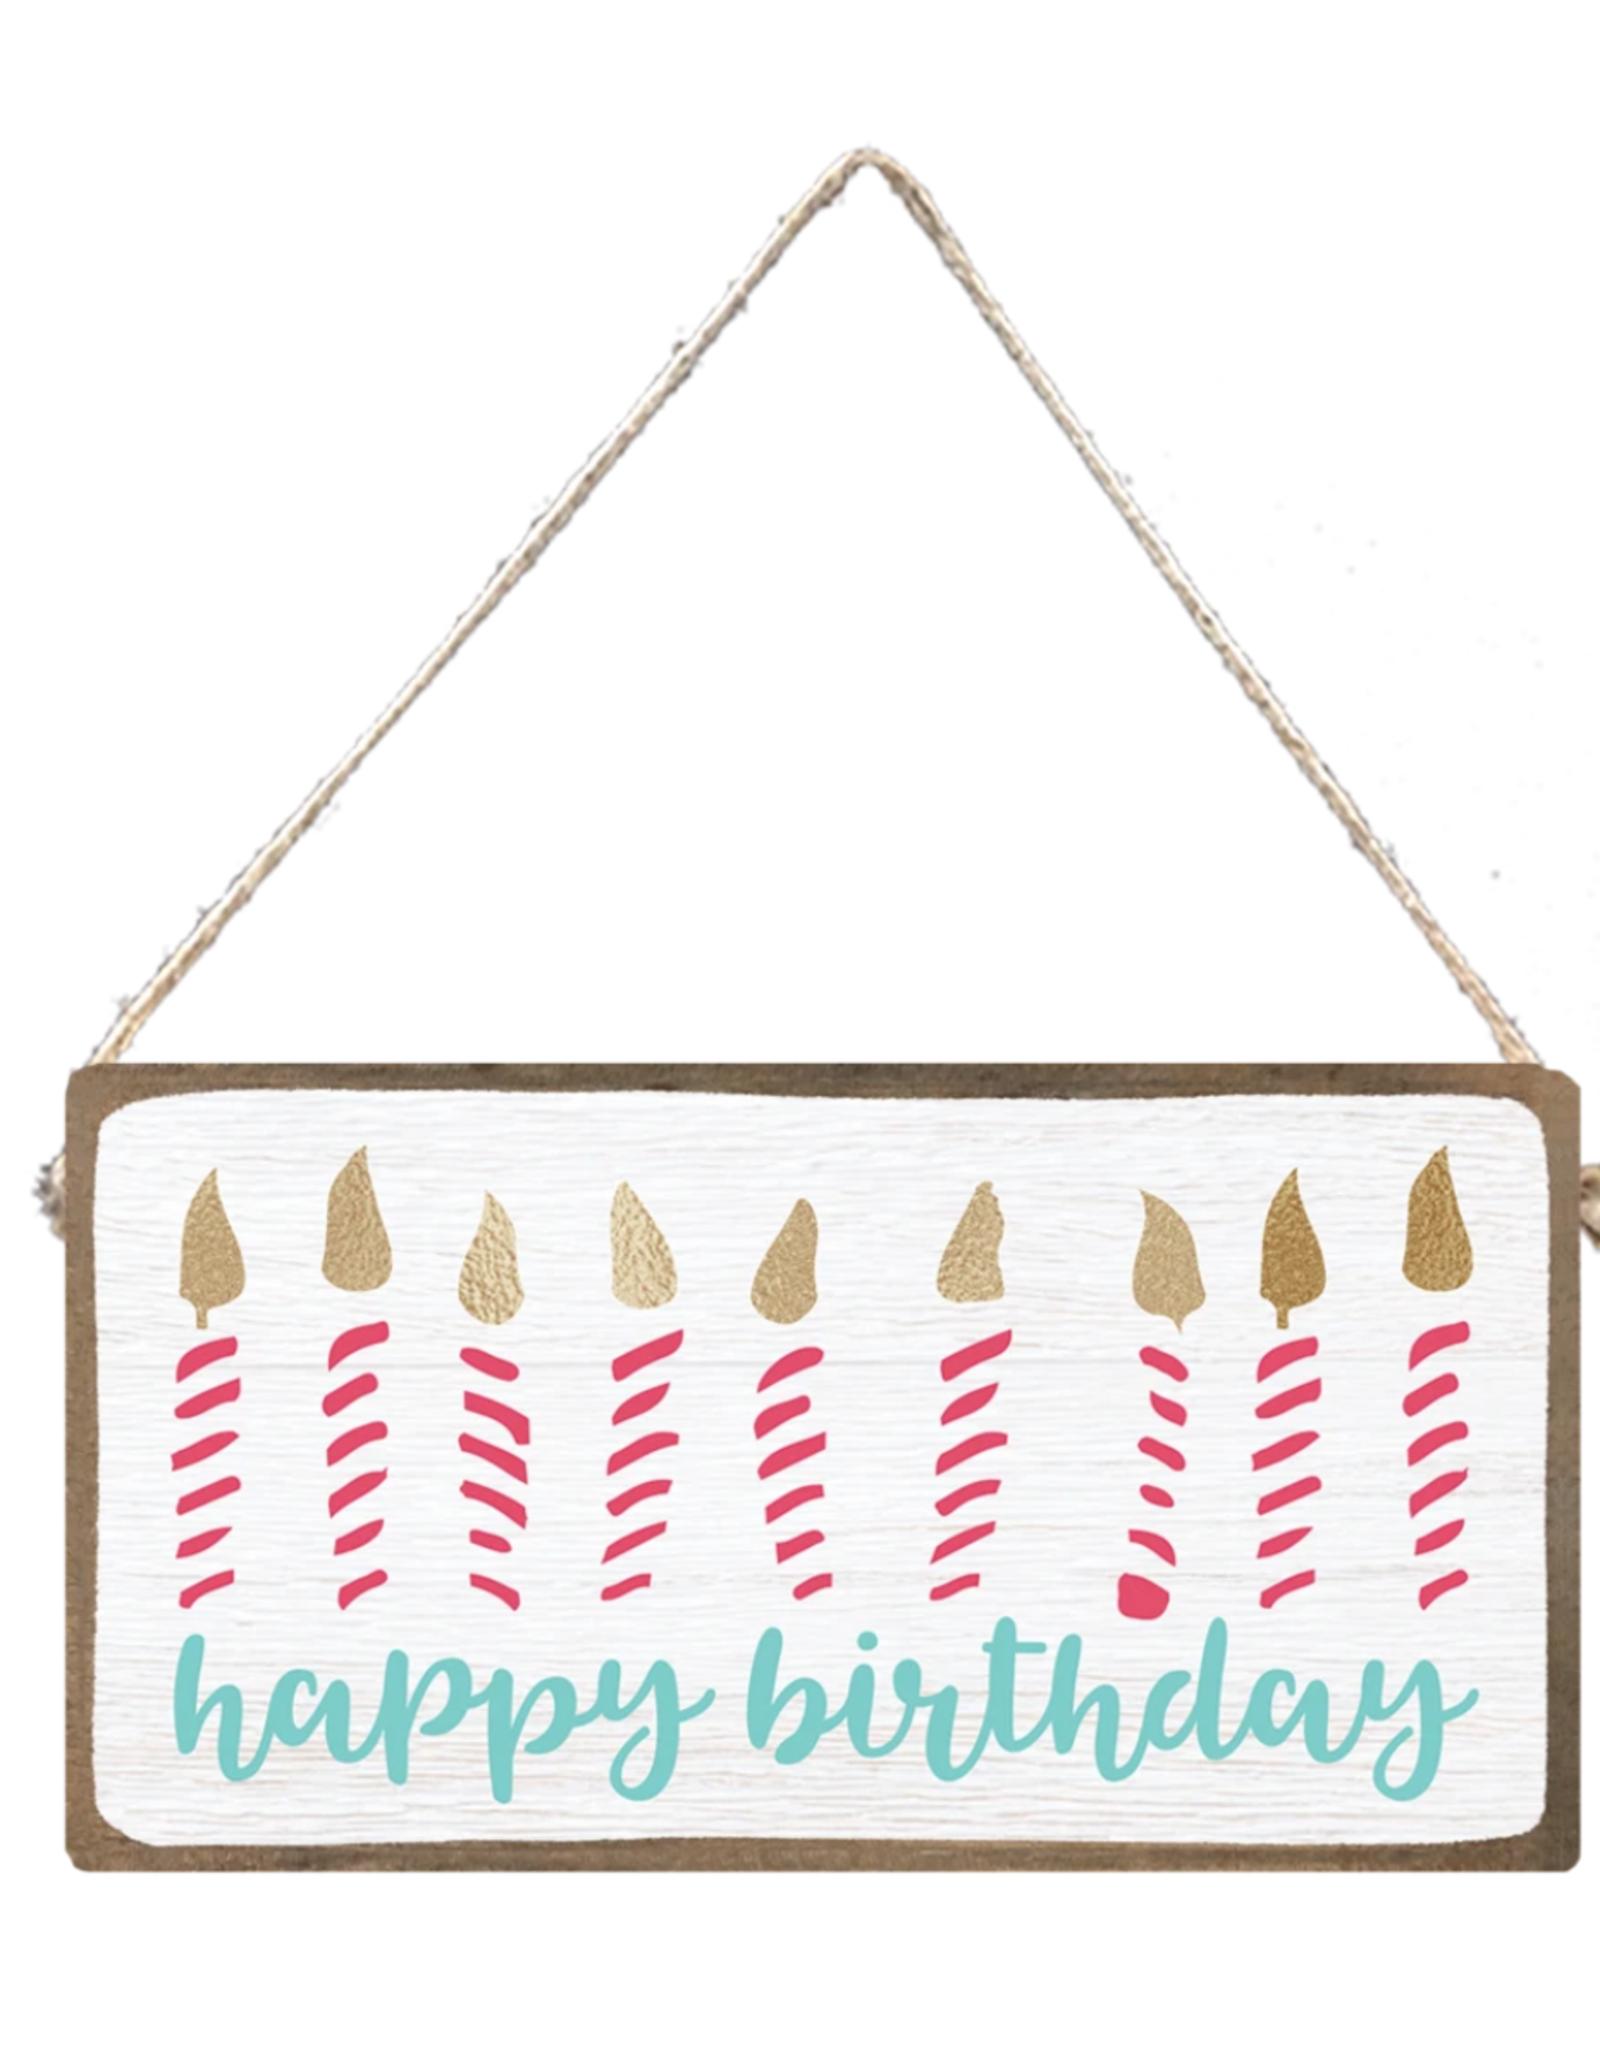 Rustic Marlin Rustic Marlin - Happy Birthday Mini Pank